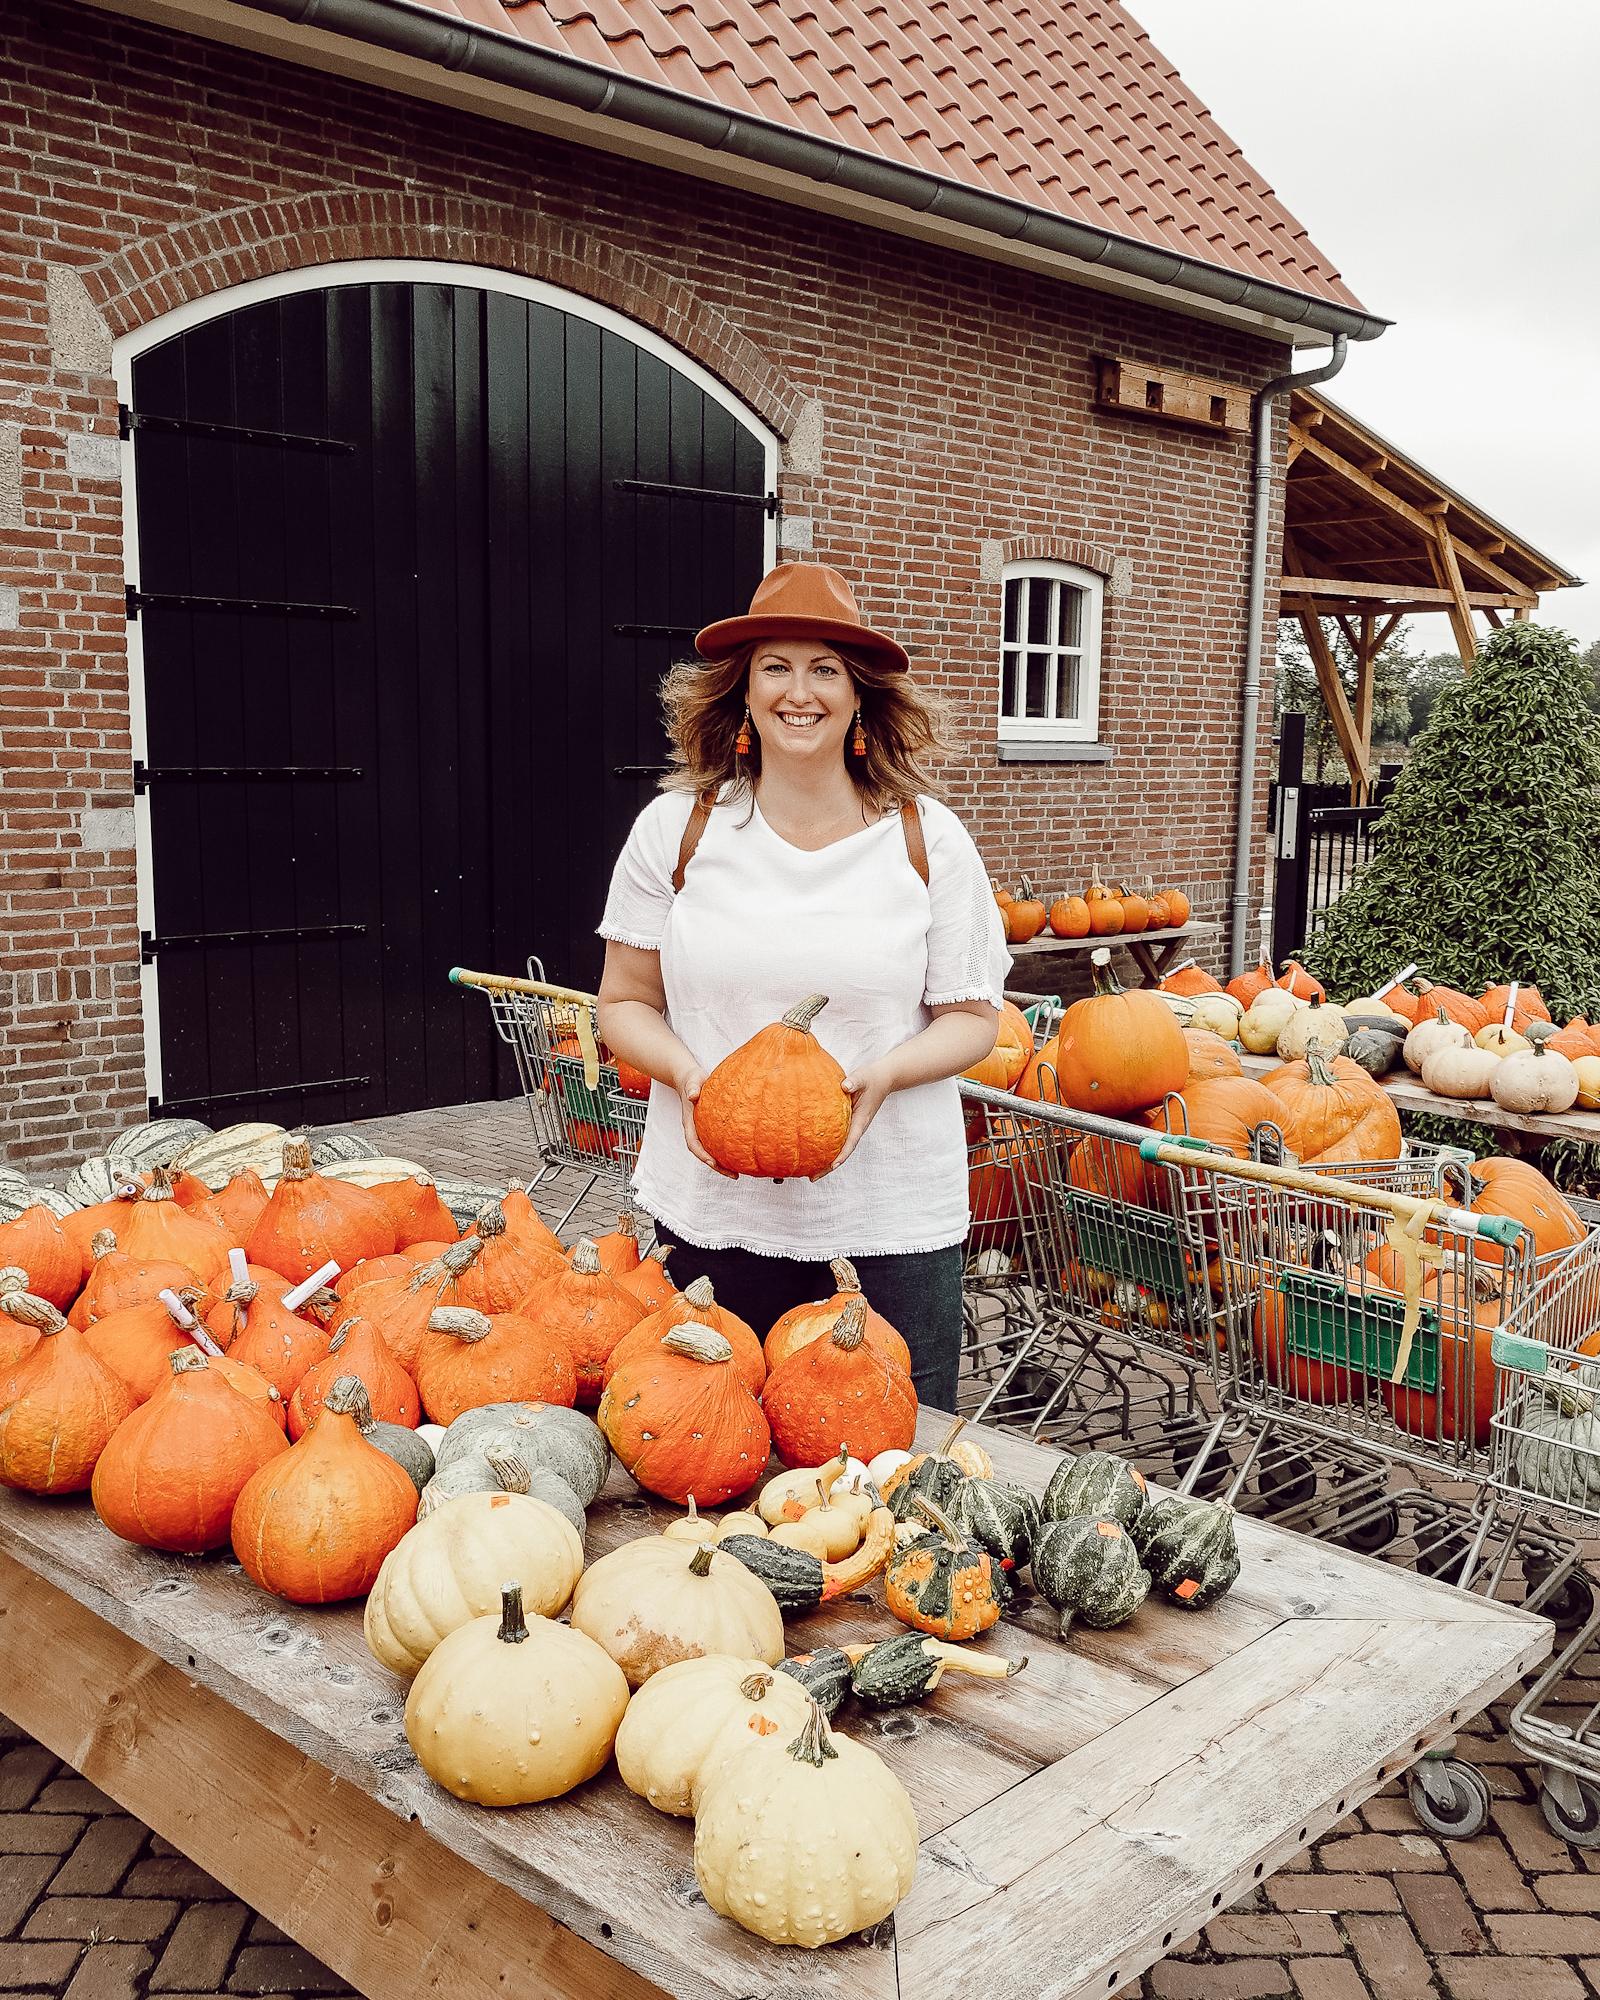 Pompoenen kopen in Brabant, pompoenerij, pompoenboerderij